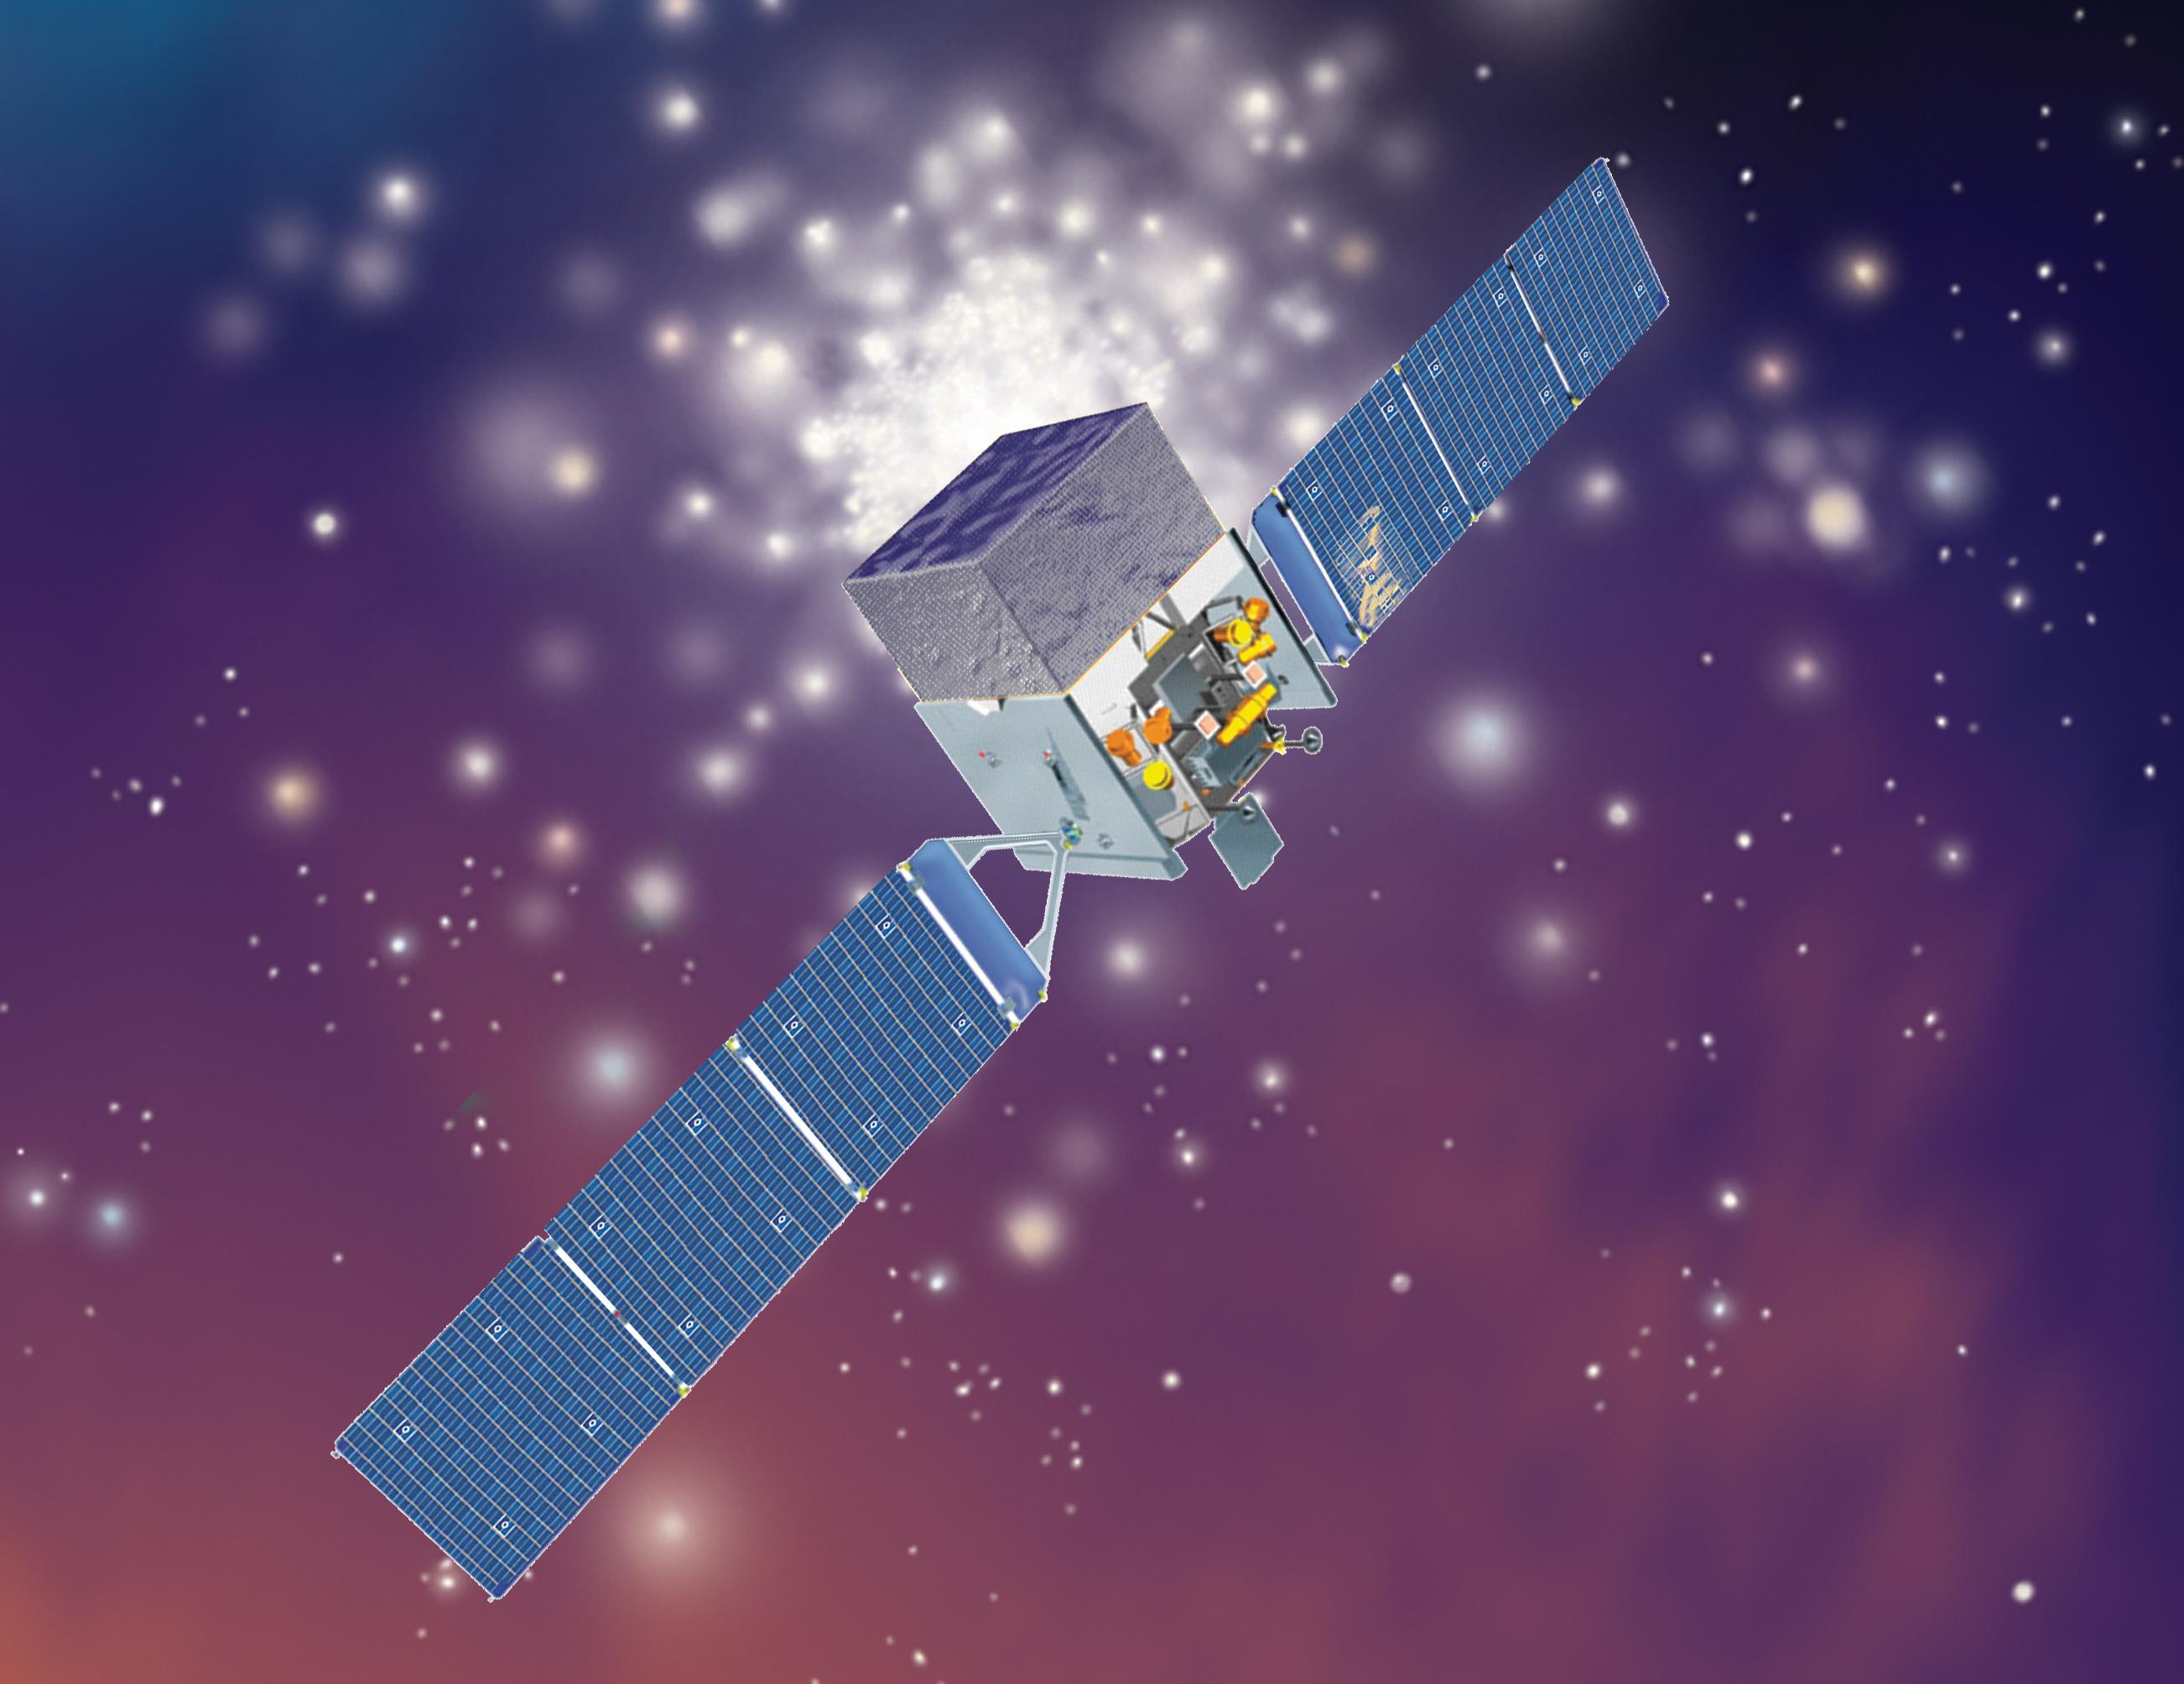 nasa illustration of the glast spacecraft